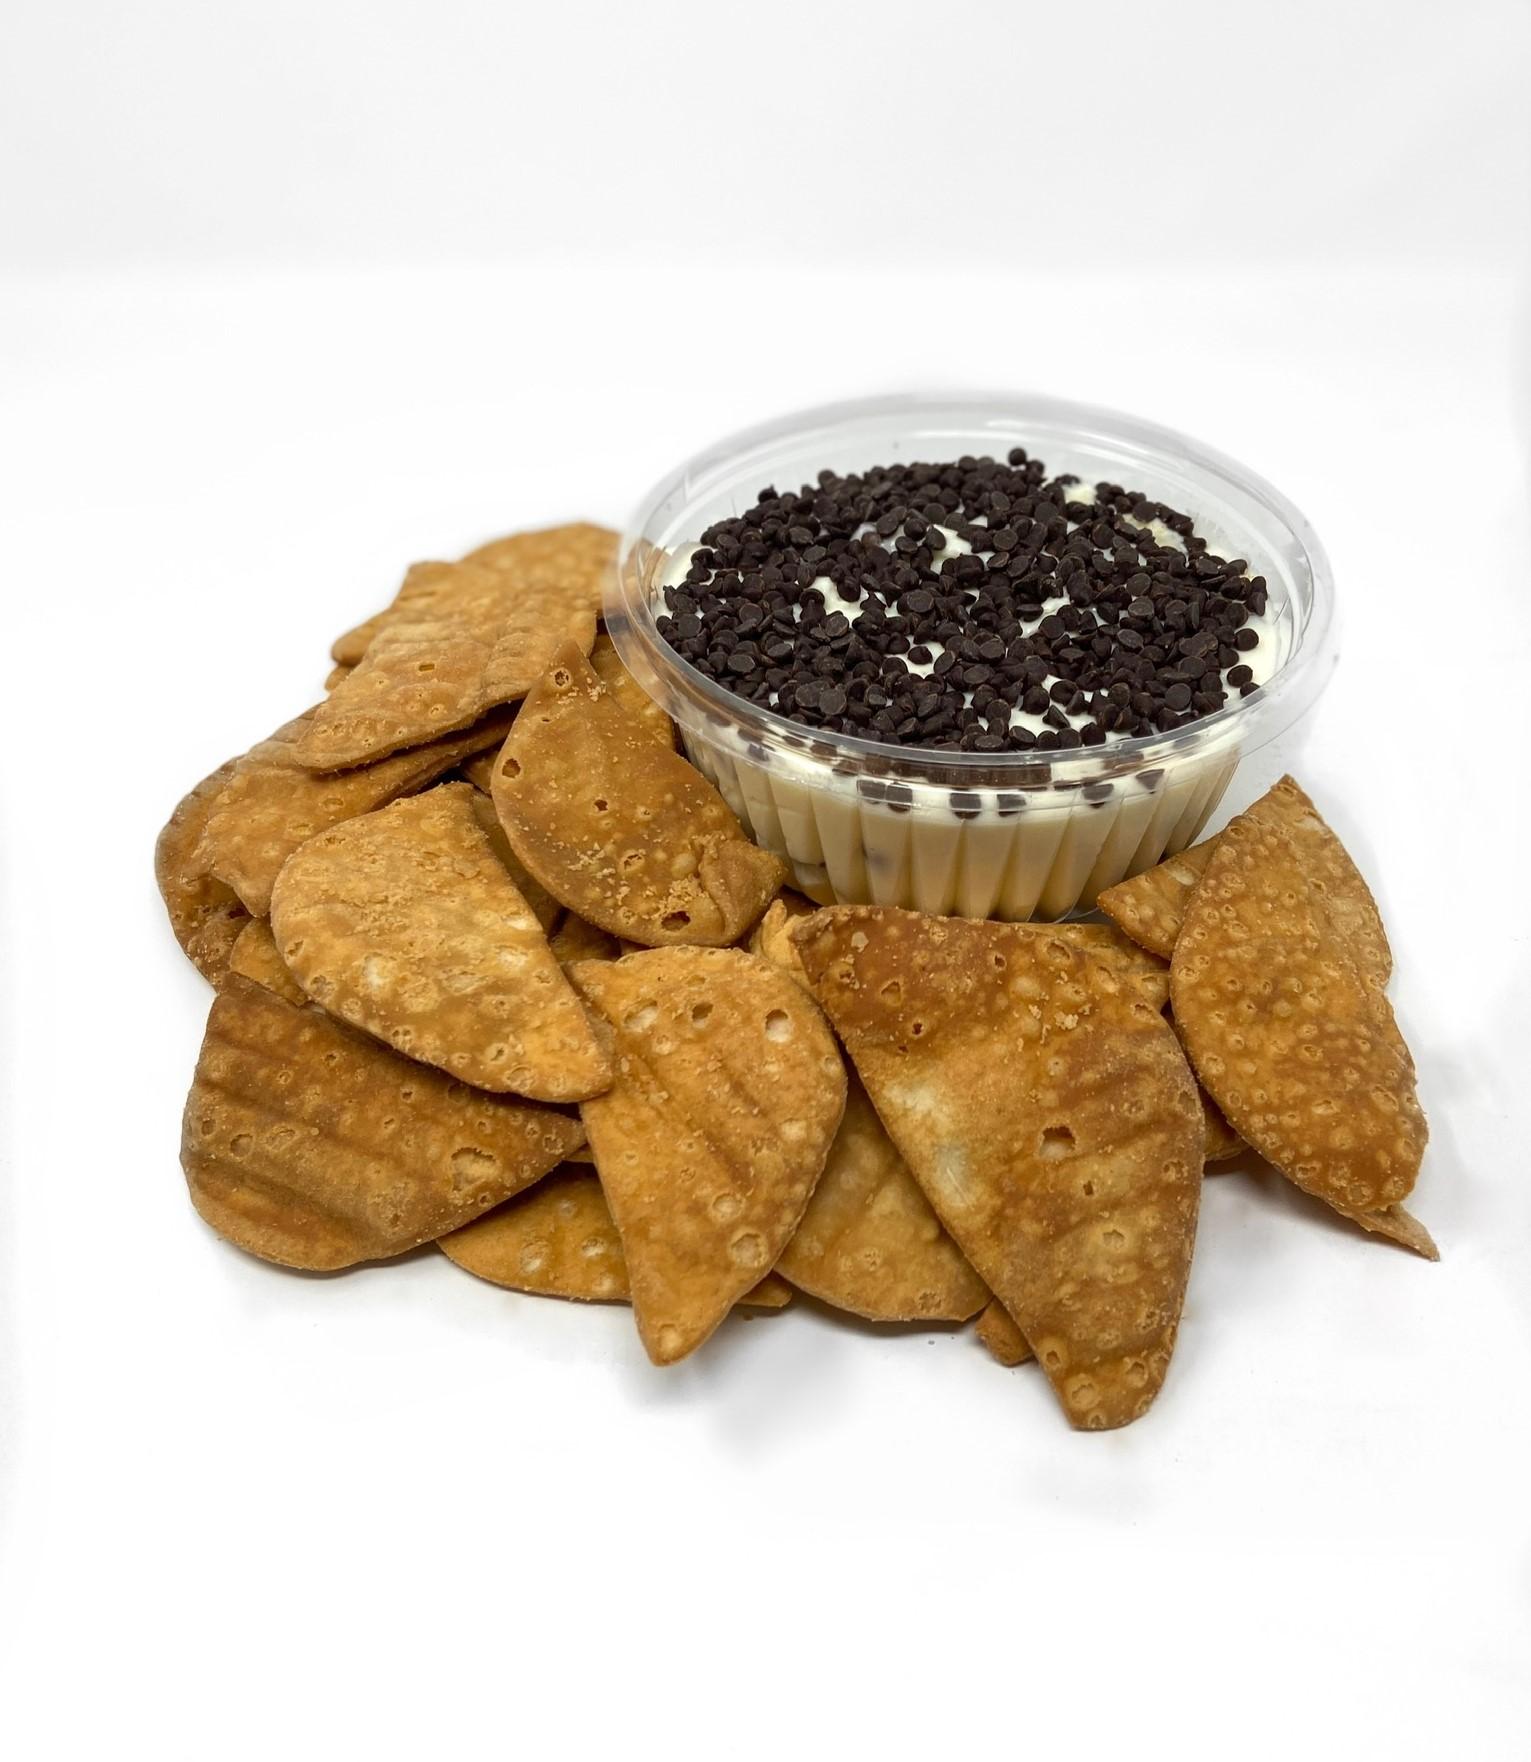 Cannoli Cream Bowl with Cannoli Chips